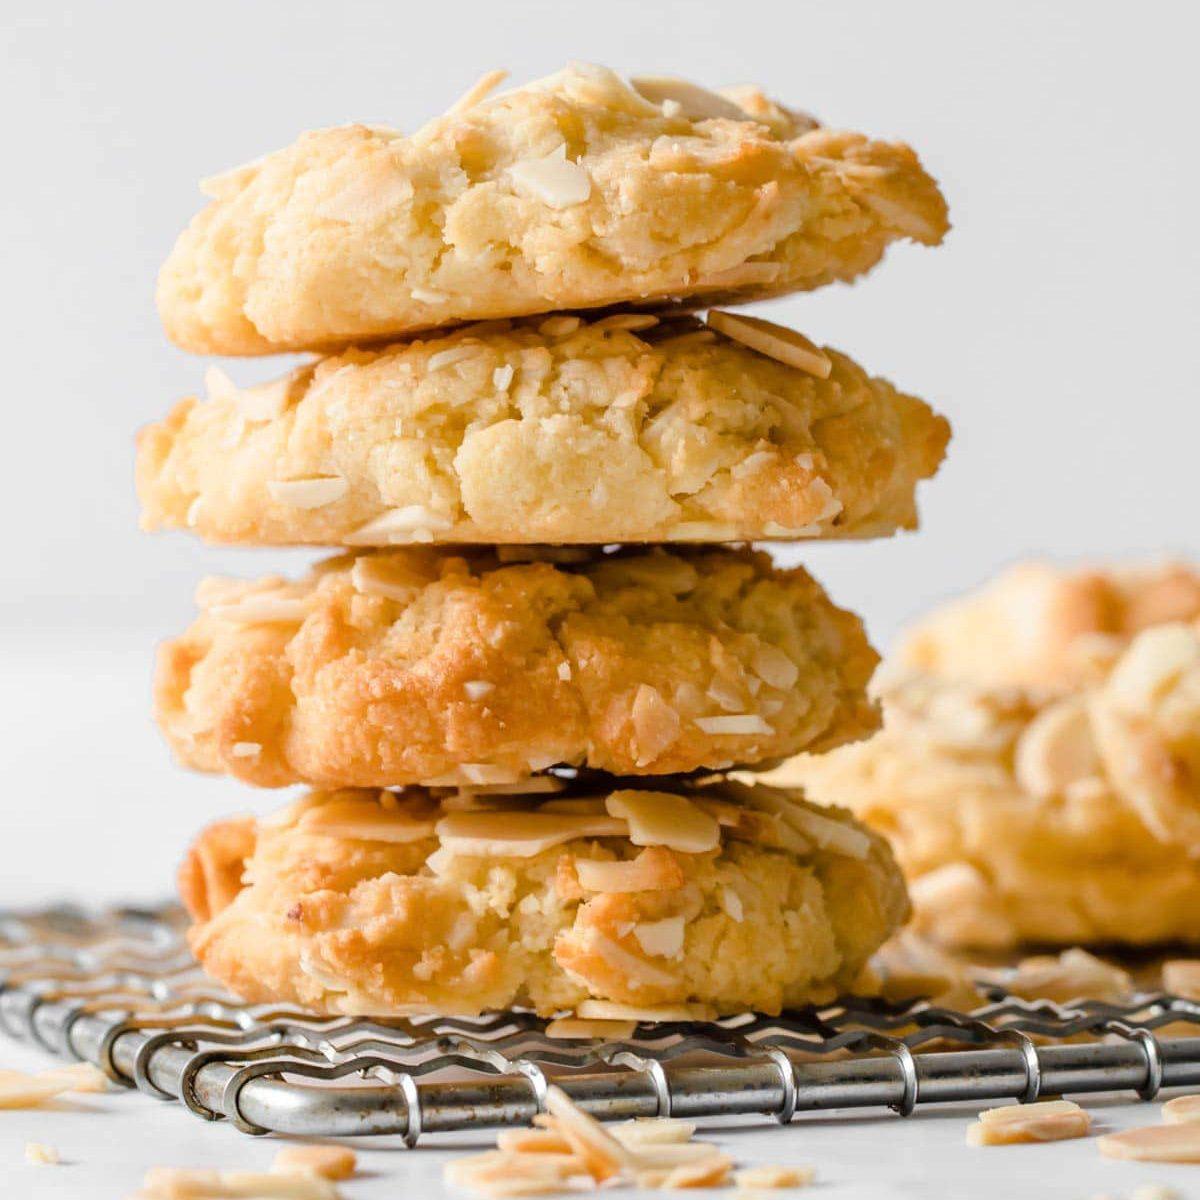 A stack of sugar-free keto oatmeal cookies.